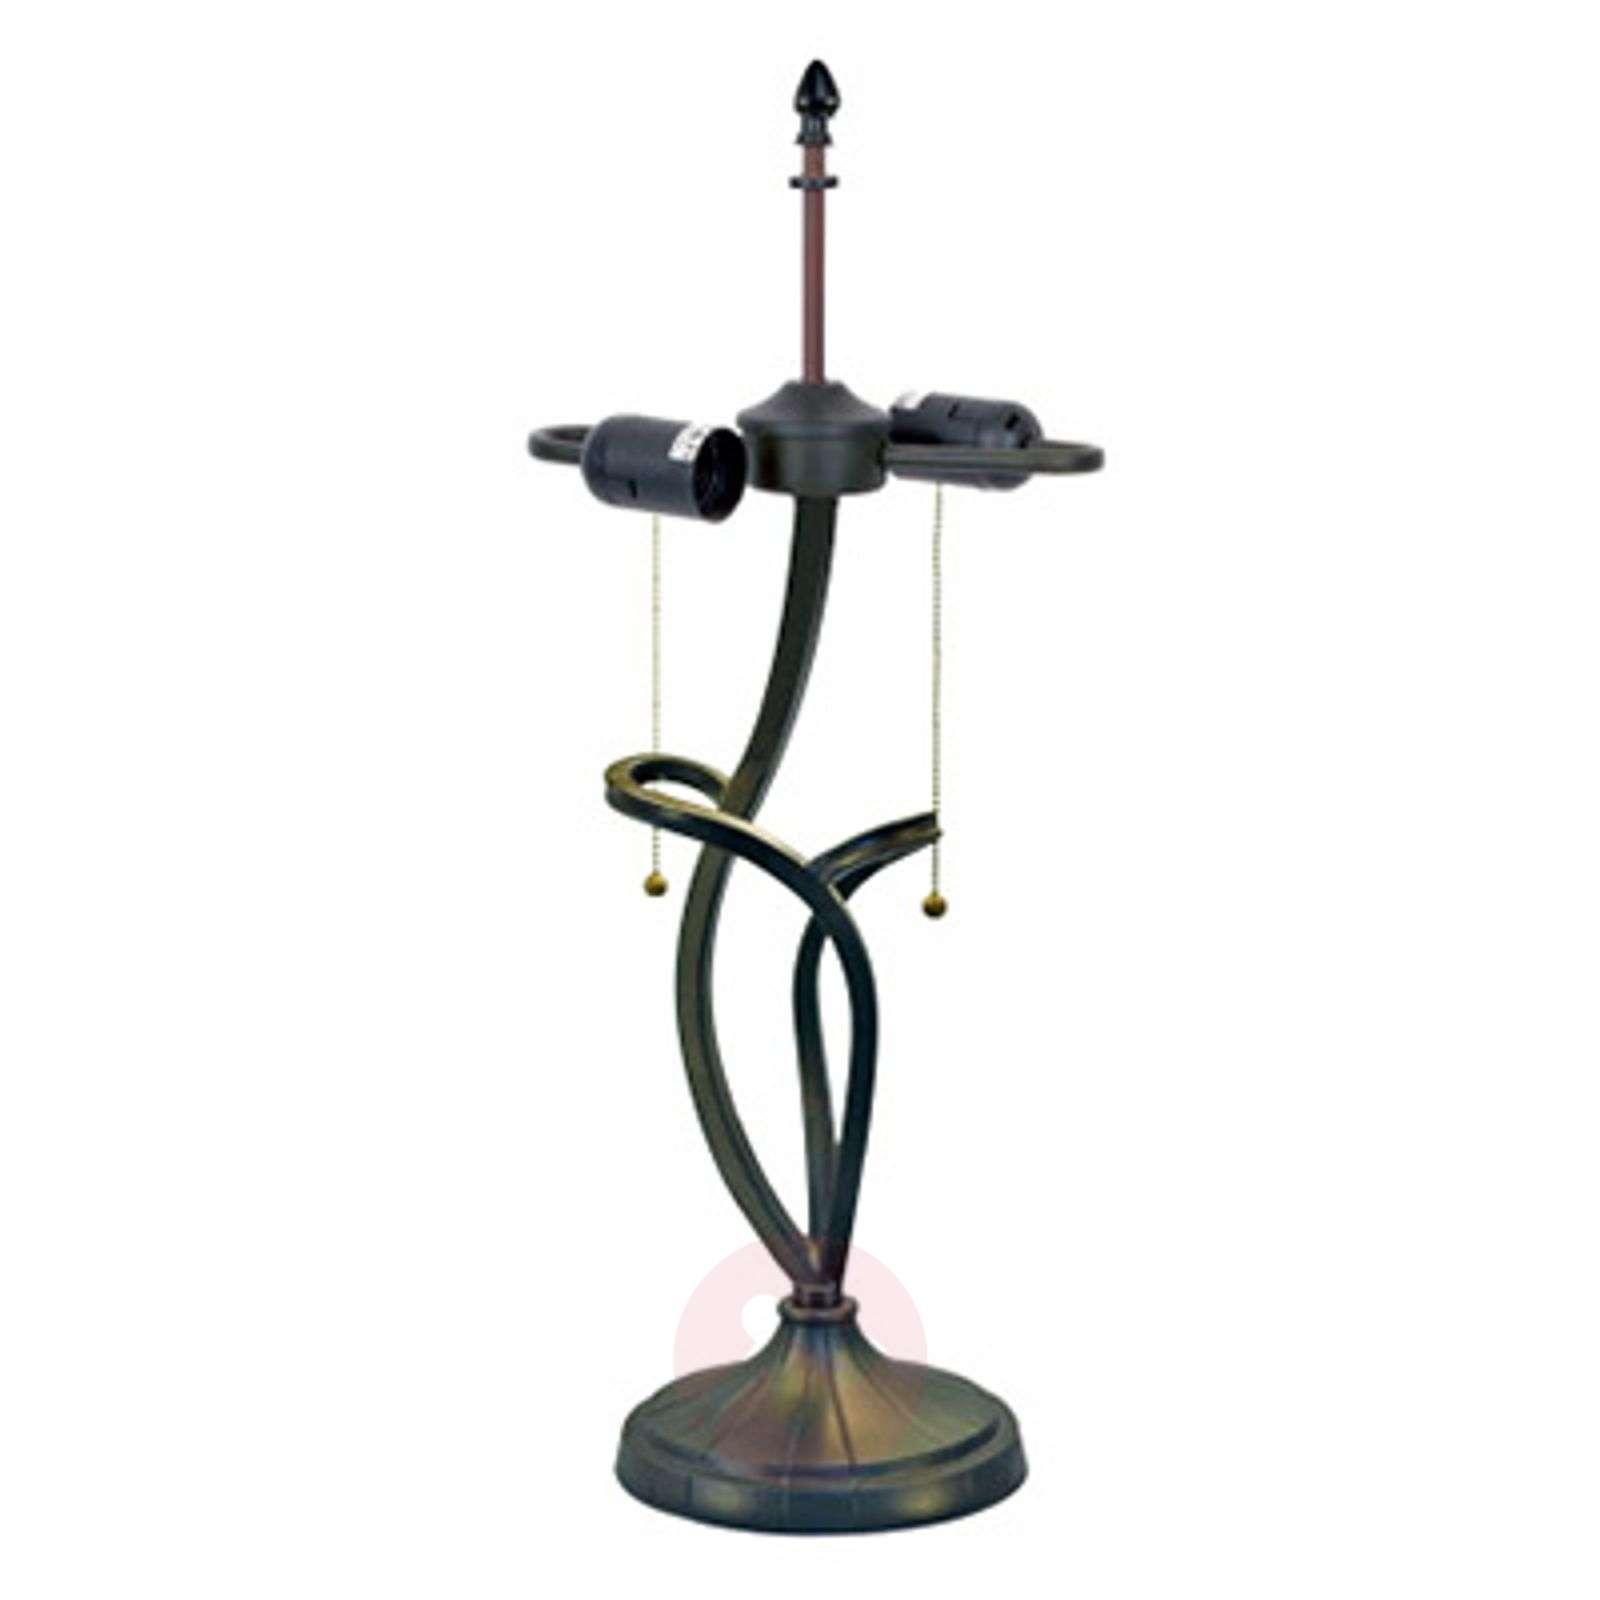 Magical table lamp Parisa, Tiffany style-1032320-01